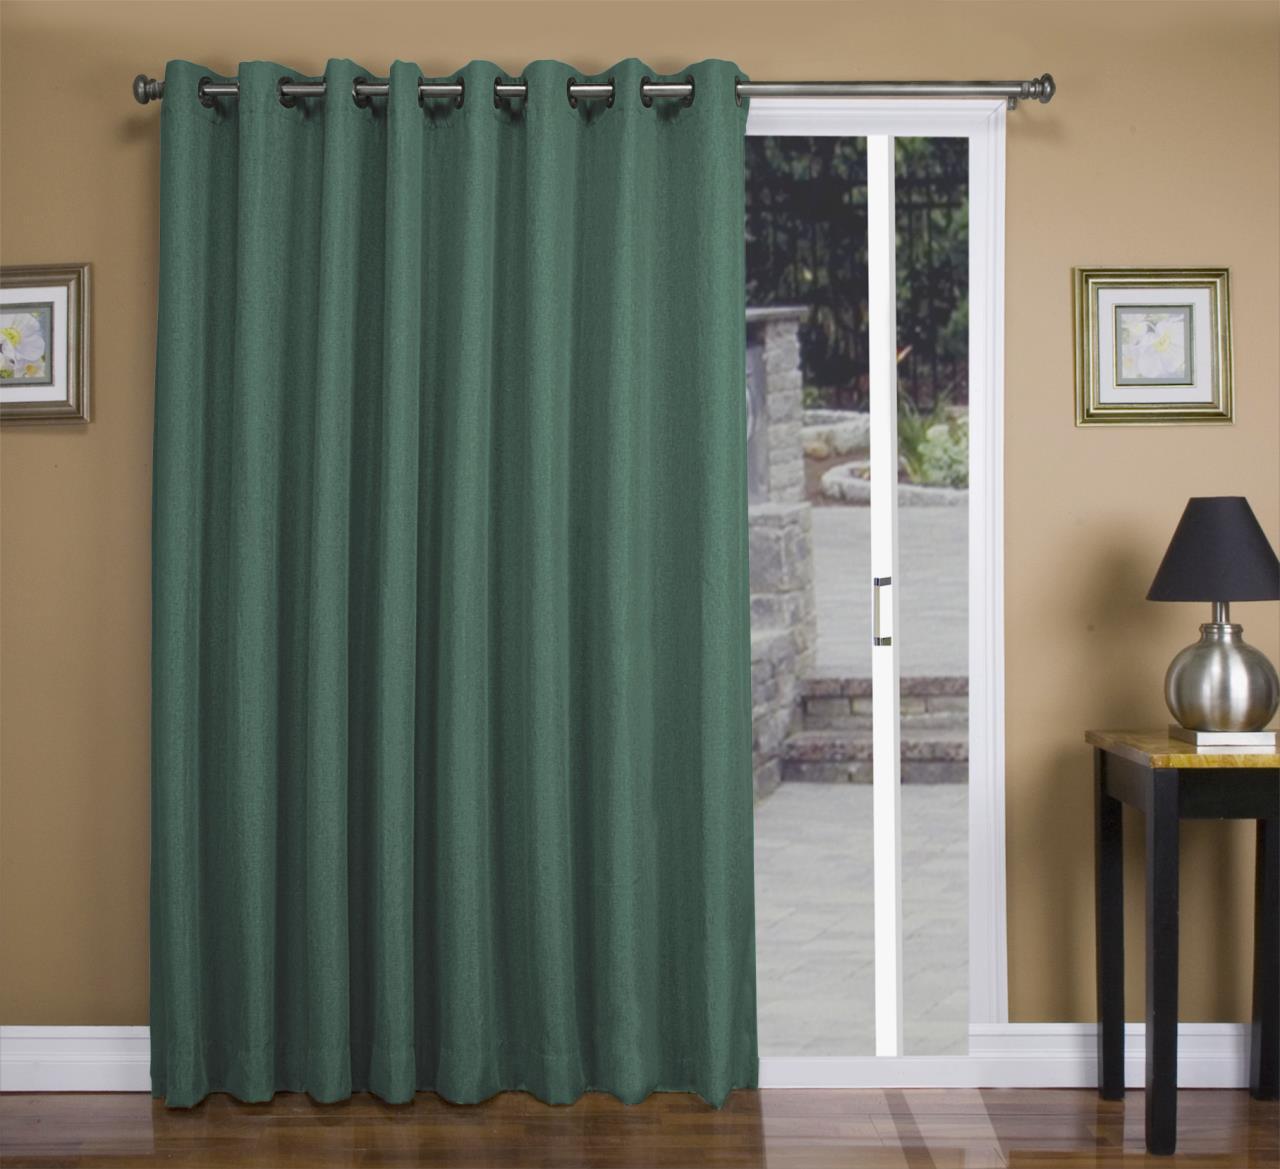 Tacoma Double Blackout Grommet Patio Curtain Panel - 842249034947